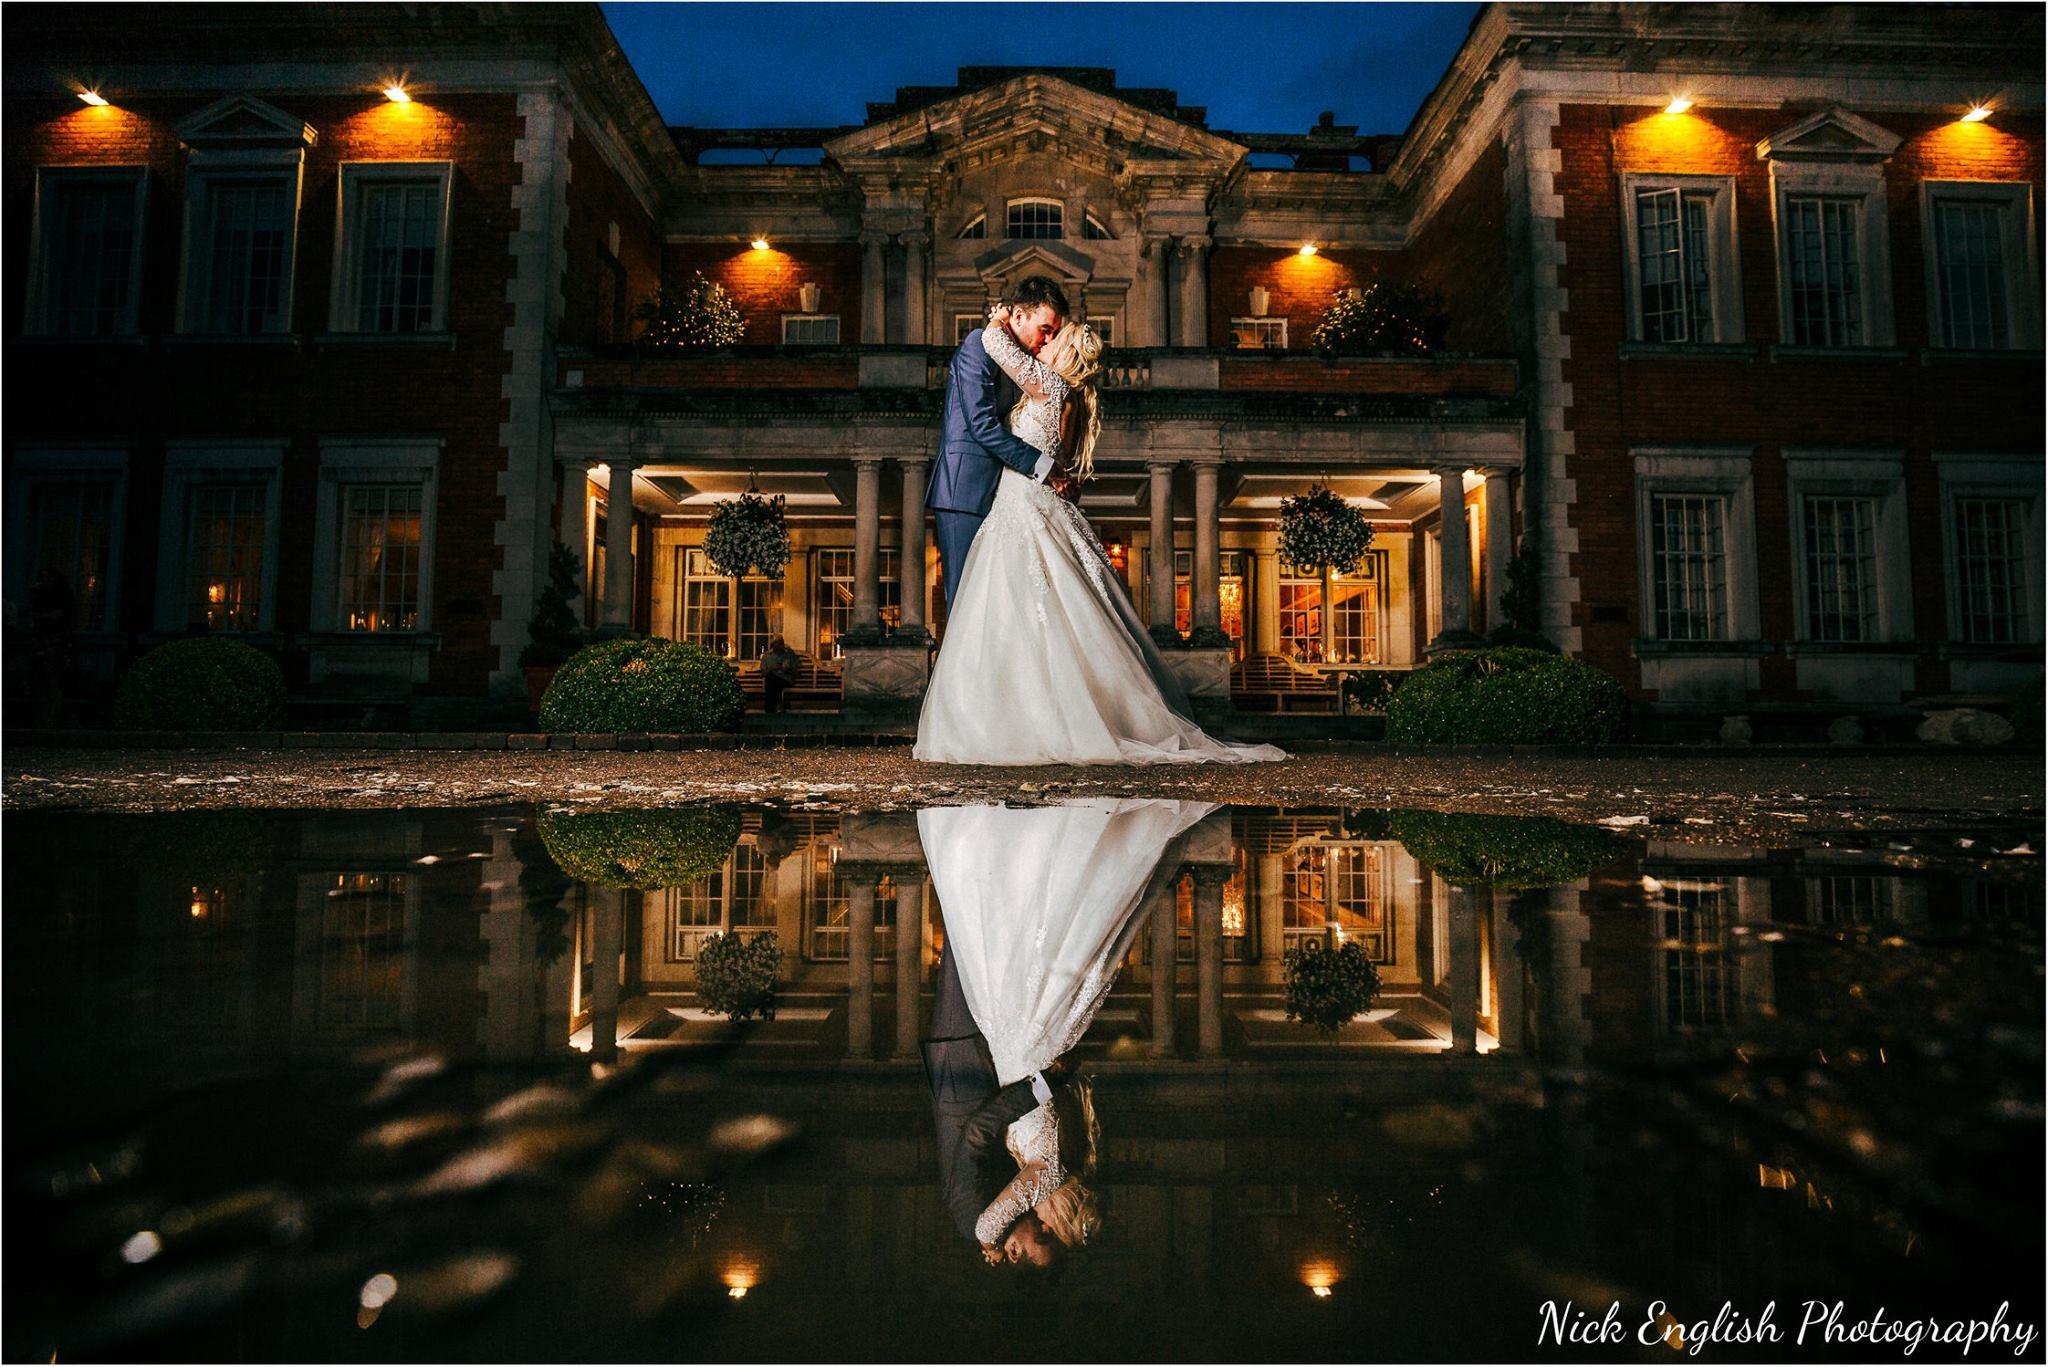 Eaves Hall Wedding Photographer Building Lit Up Night